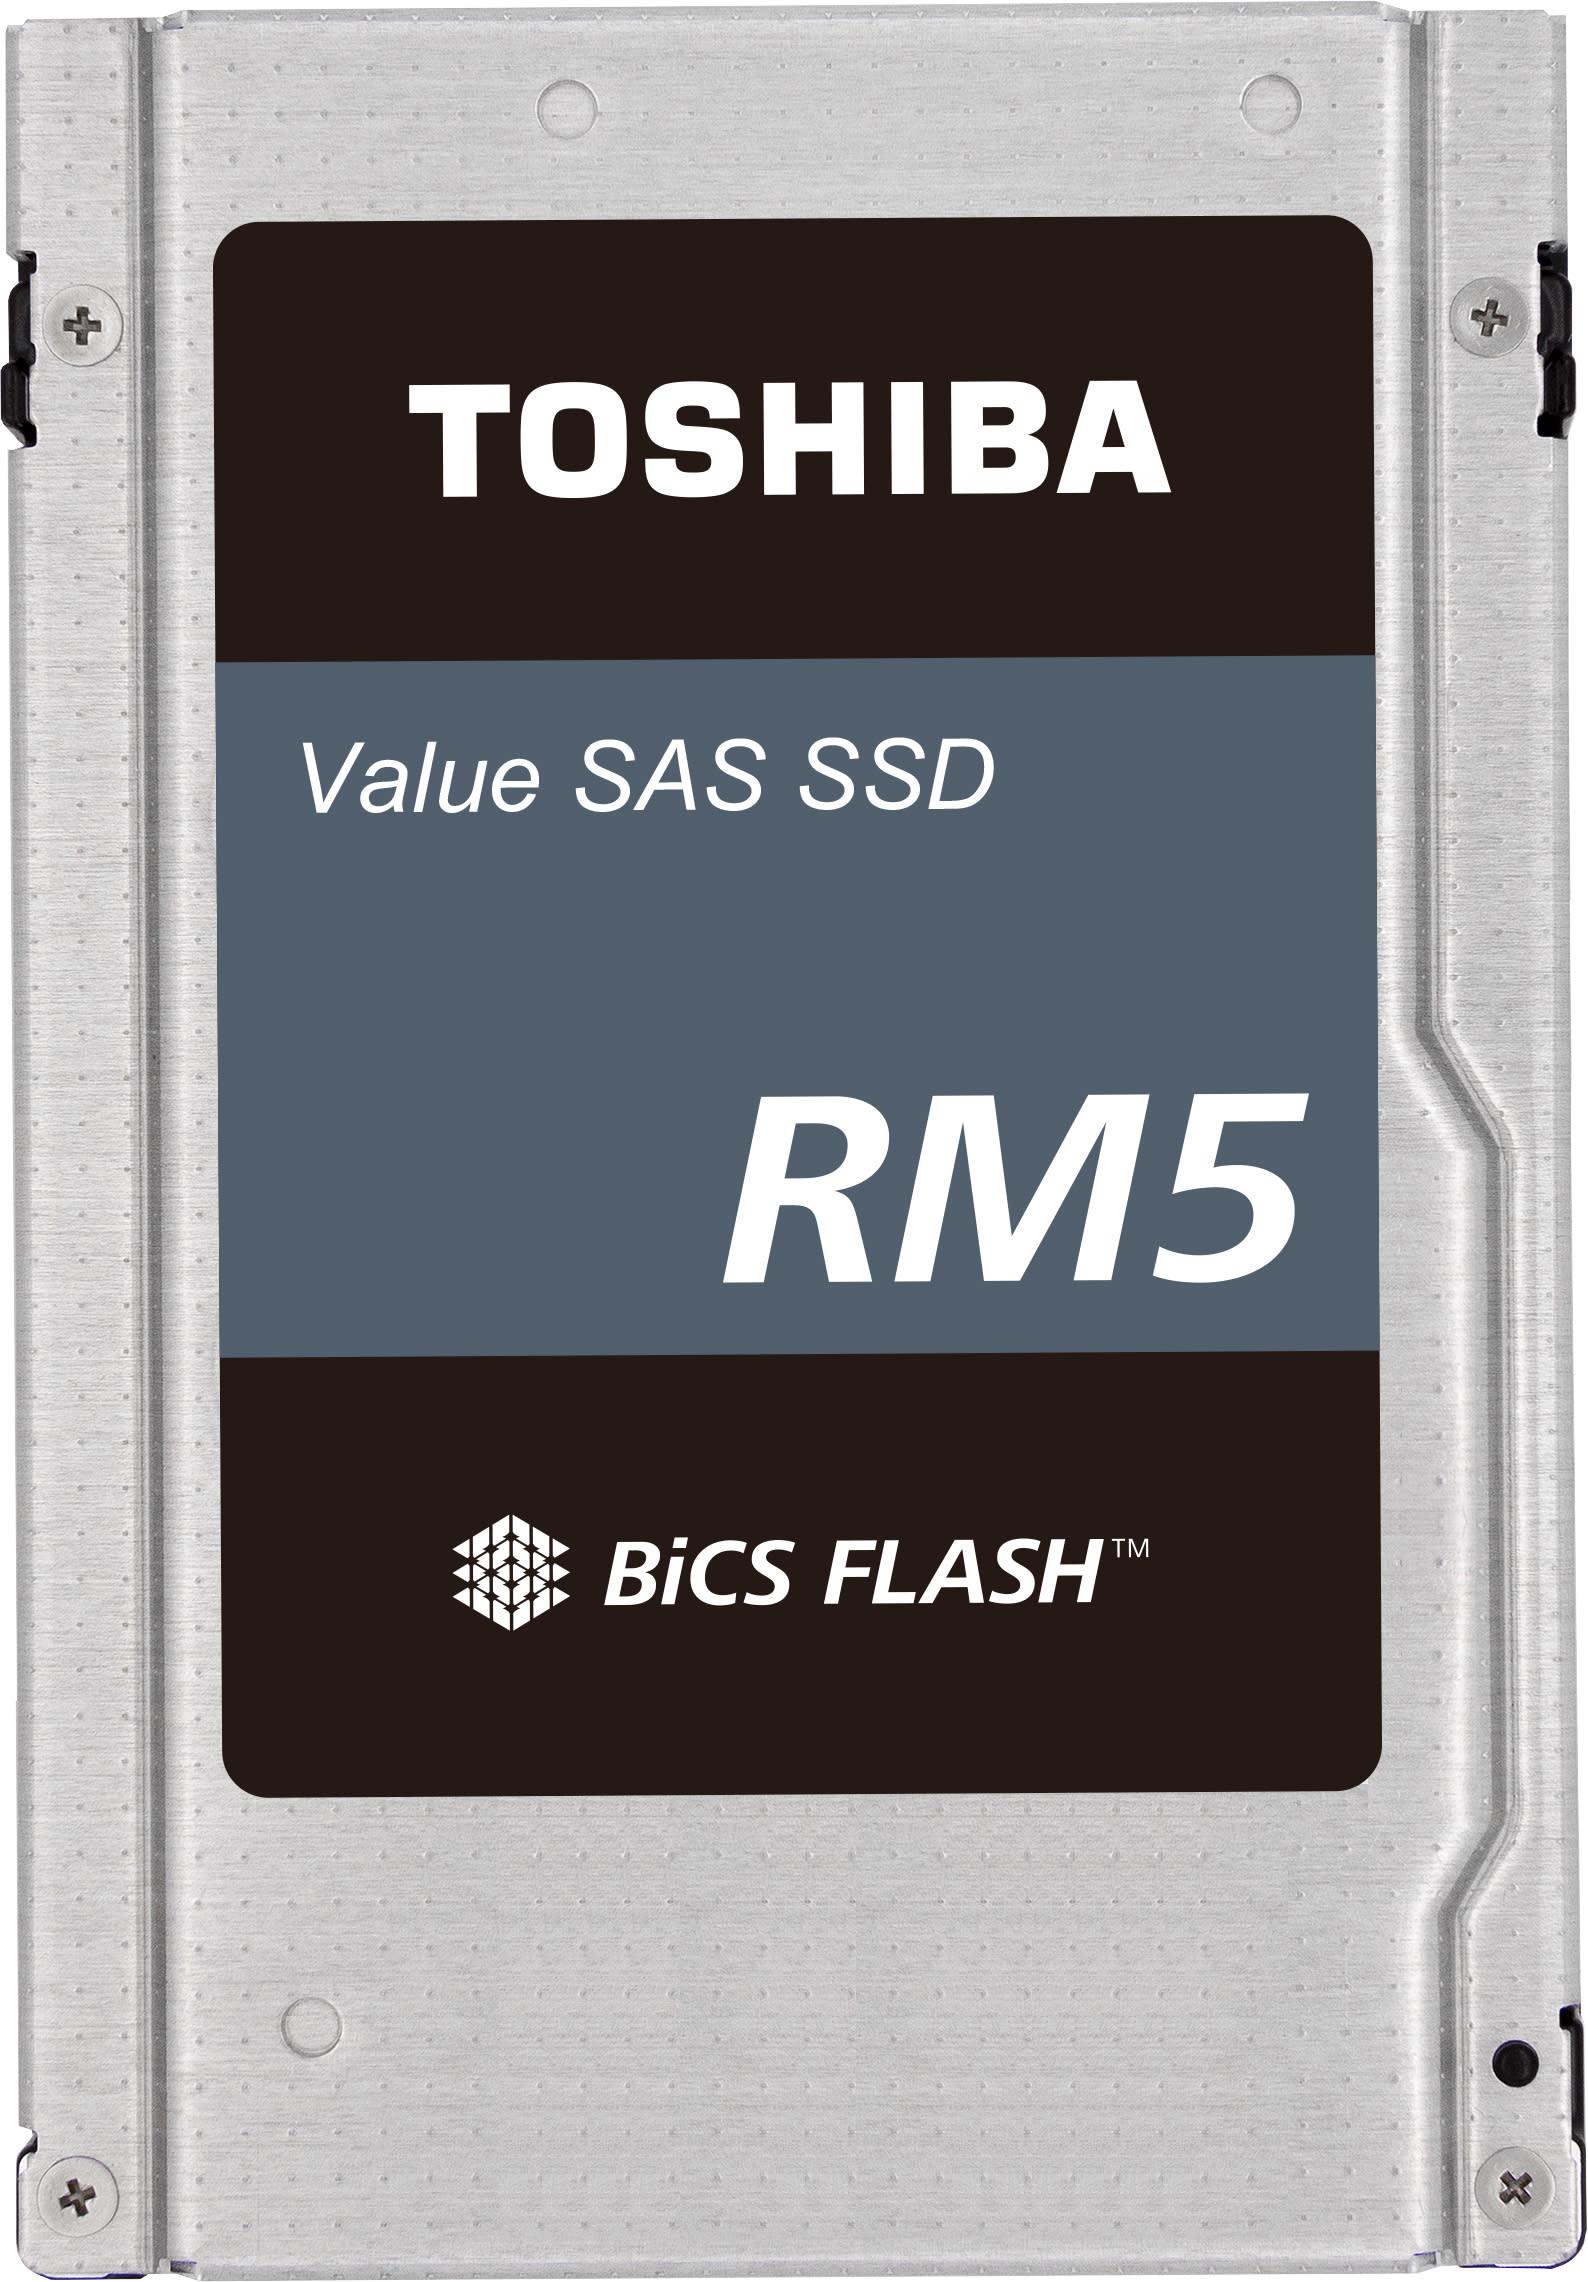 Toshiba Memory's Value SAS SSDs Earn VMware vSAN Certification Running on HPE ProLiant Gen10 Servers